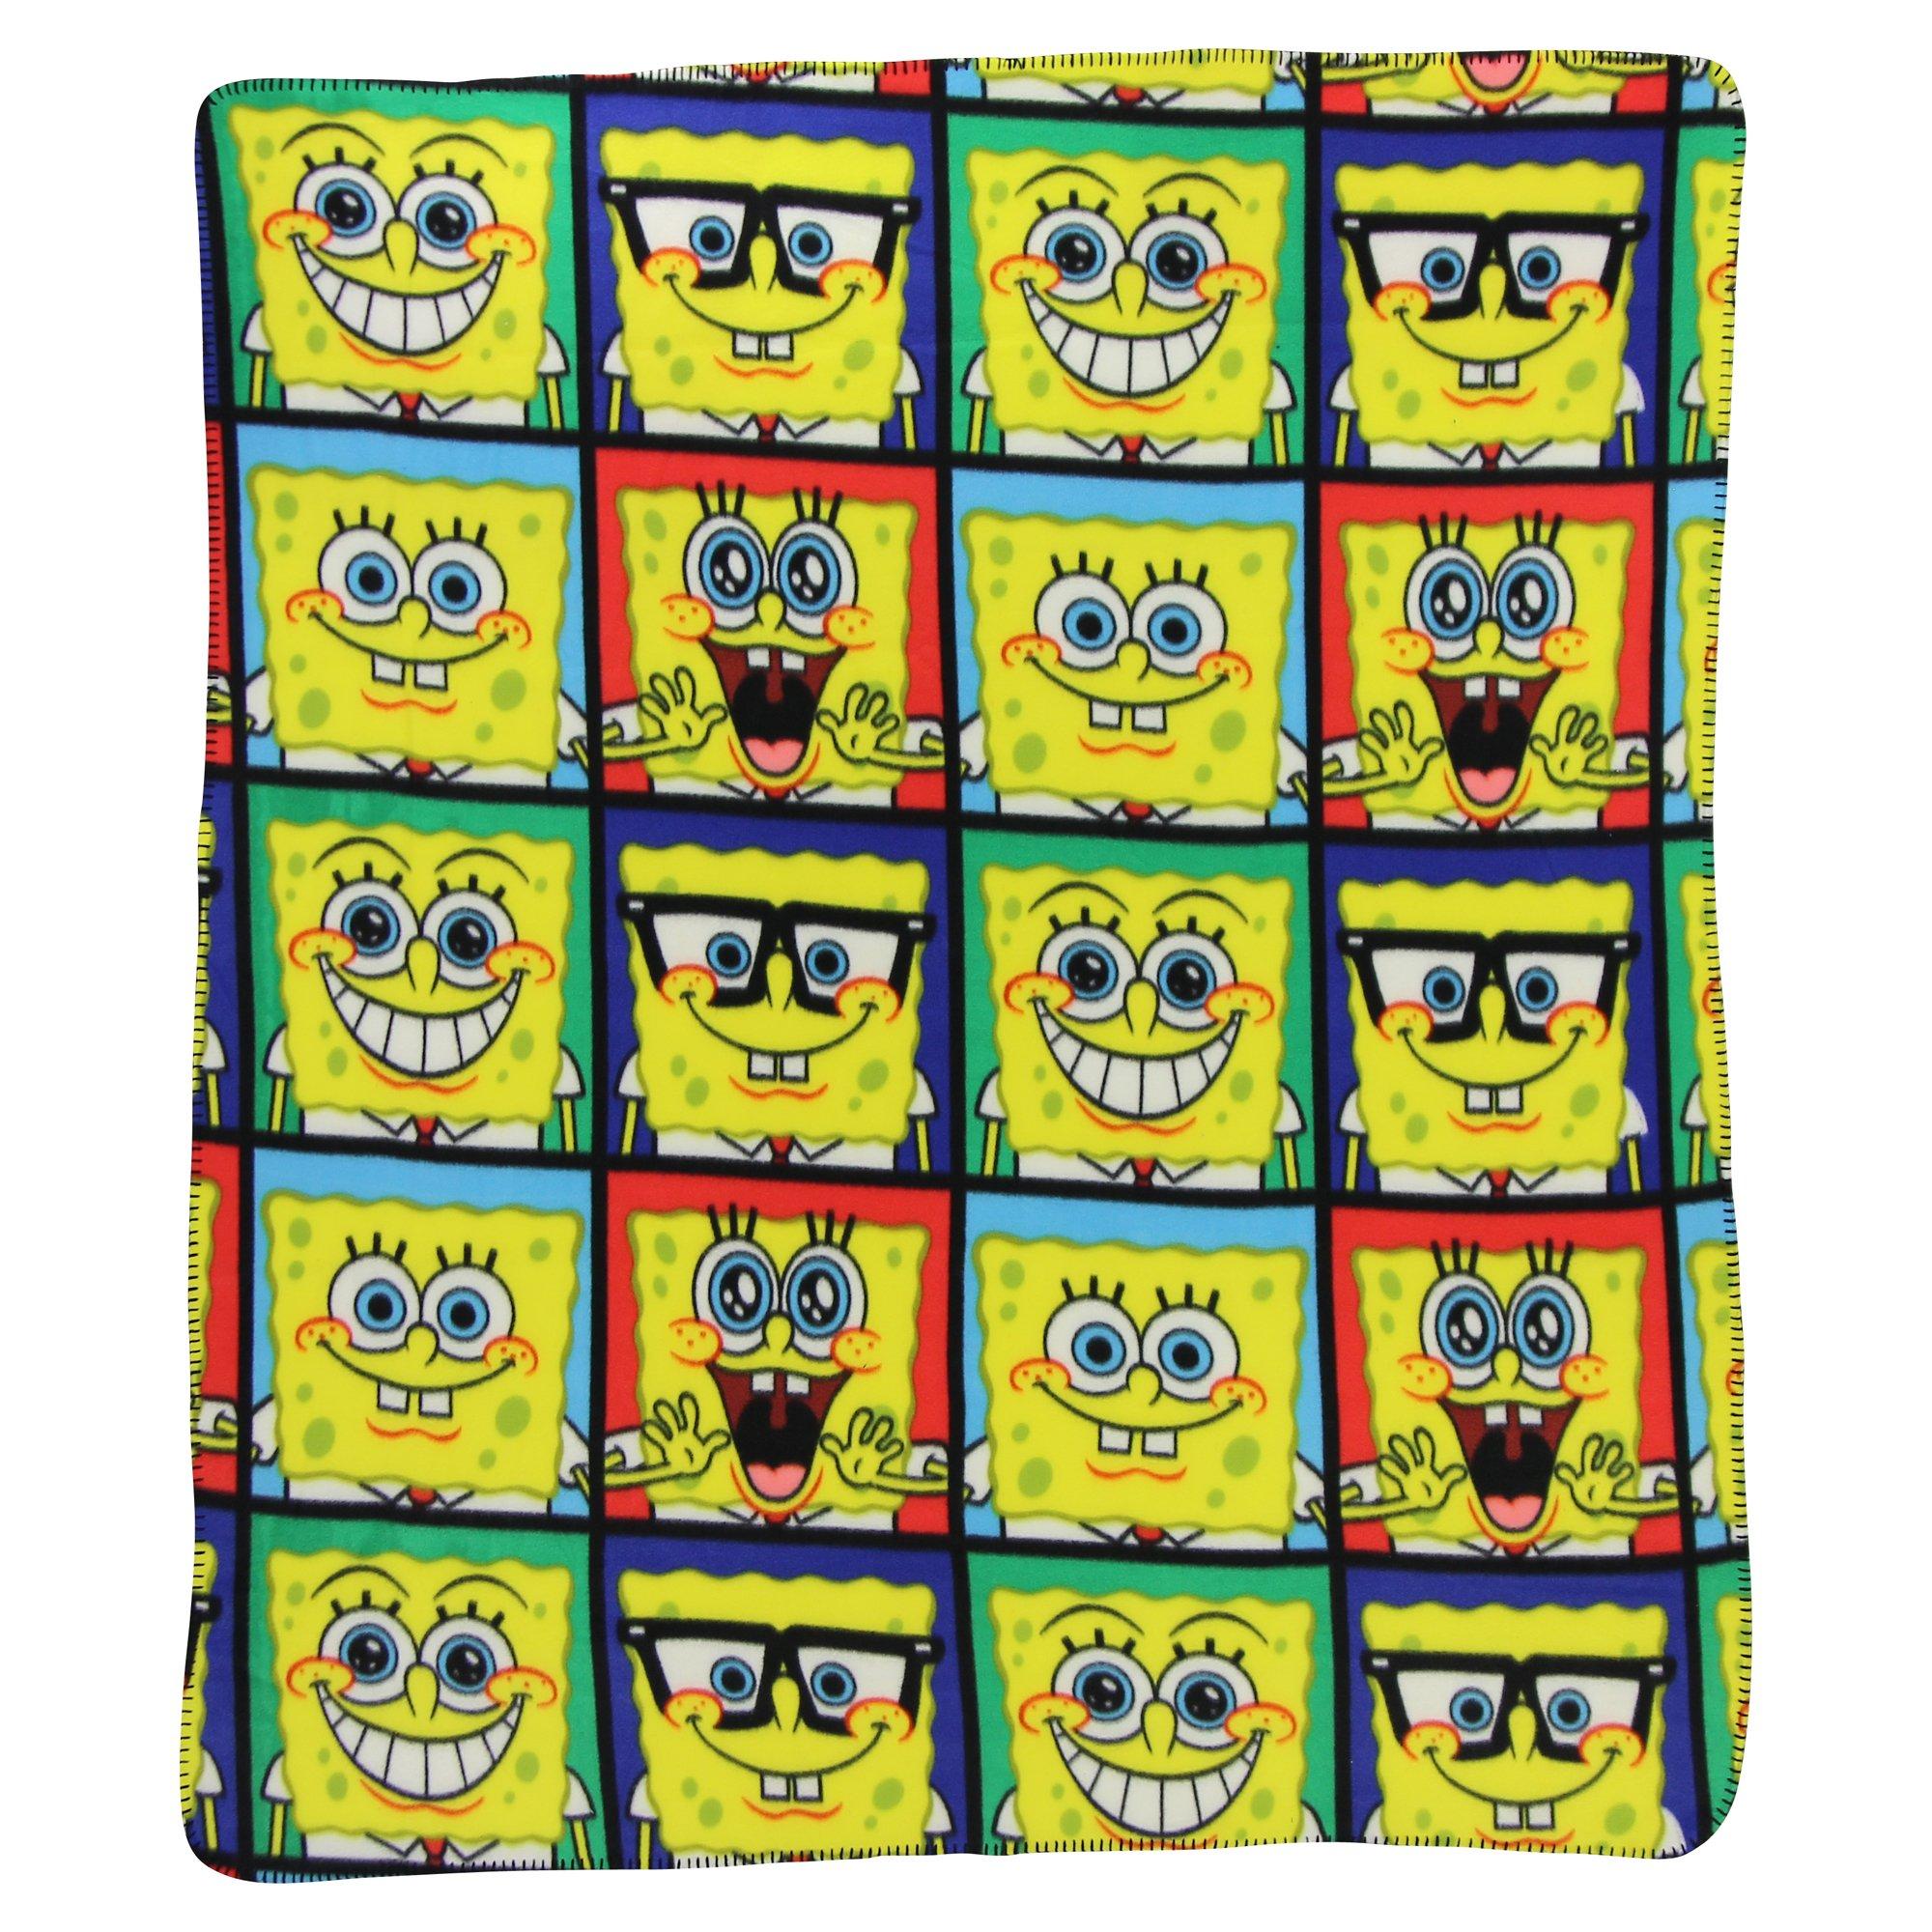 Northwest Kids Fleece Throw Blankets 50'' x 60''(Spongebob Squarepants Faces) by Northwest